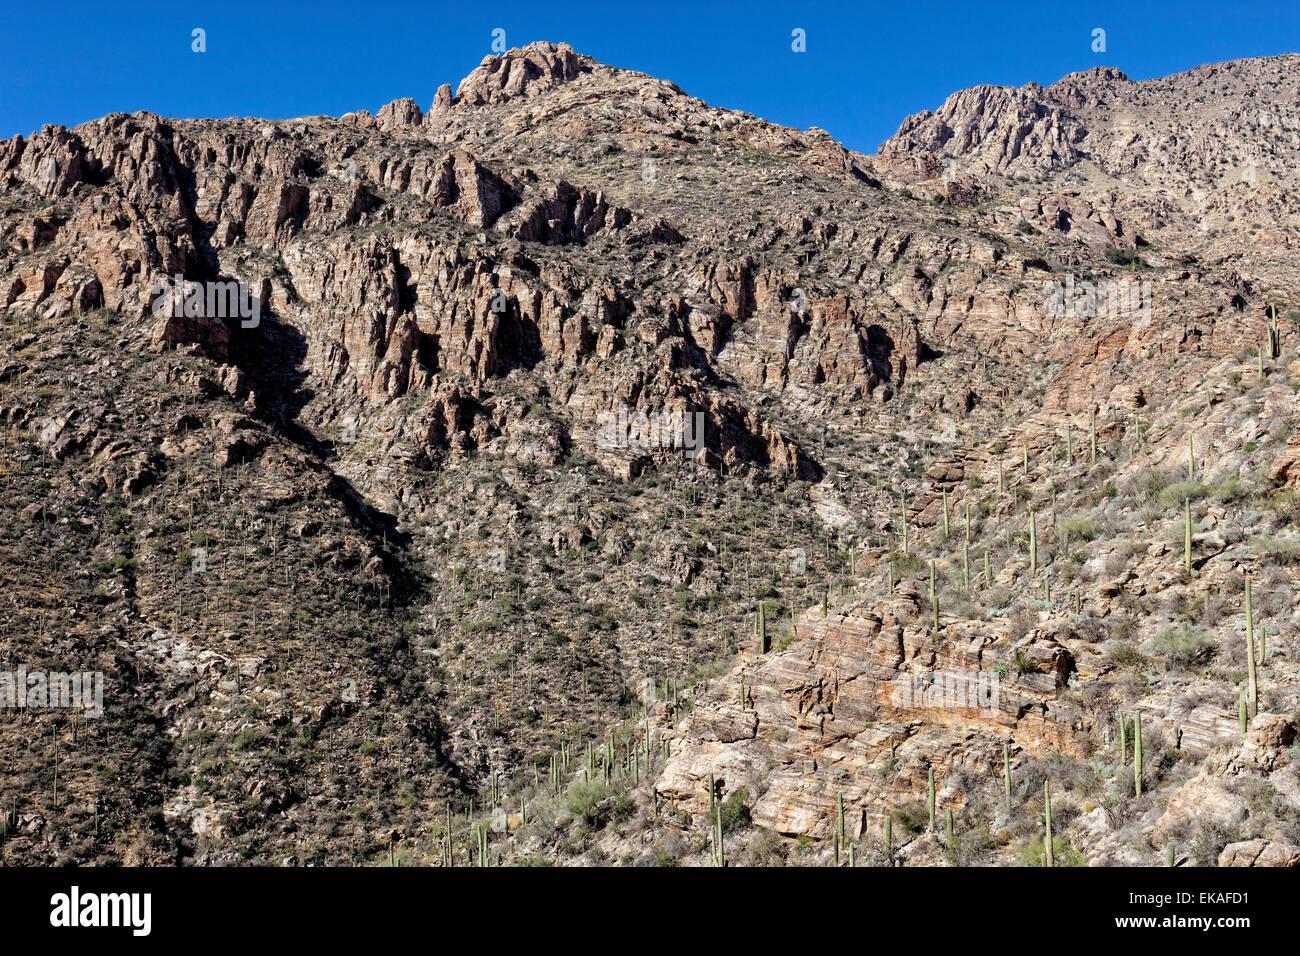 Sabino Canyon Gneiss Geology, Tucson, AZ - Stock Image